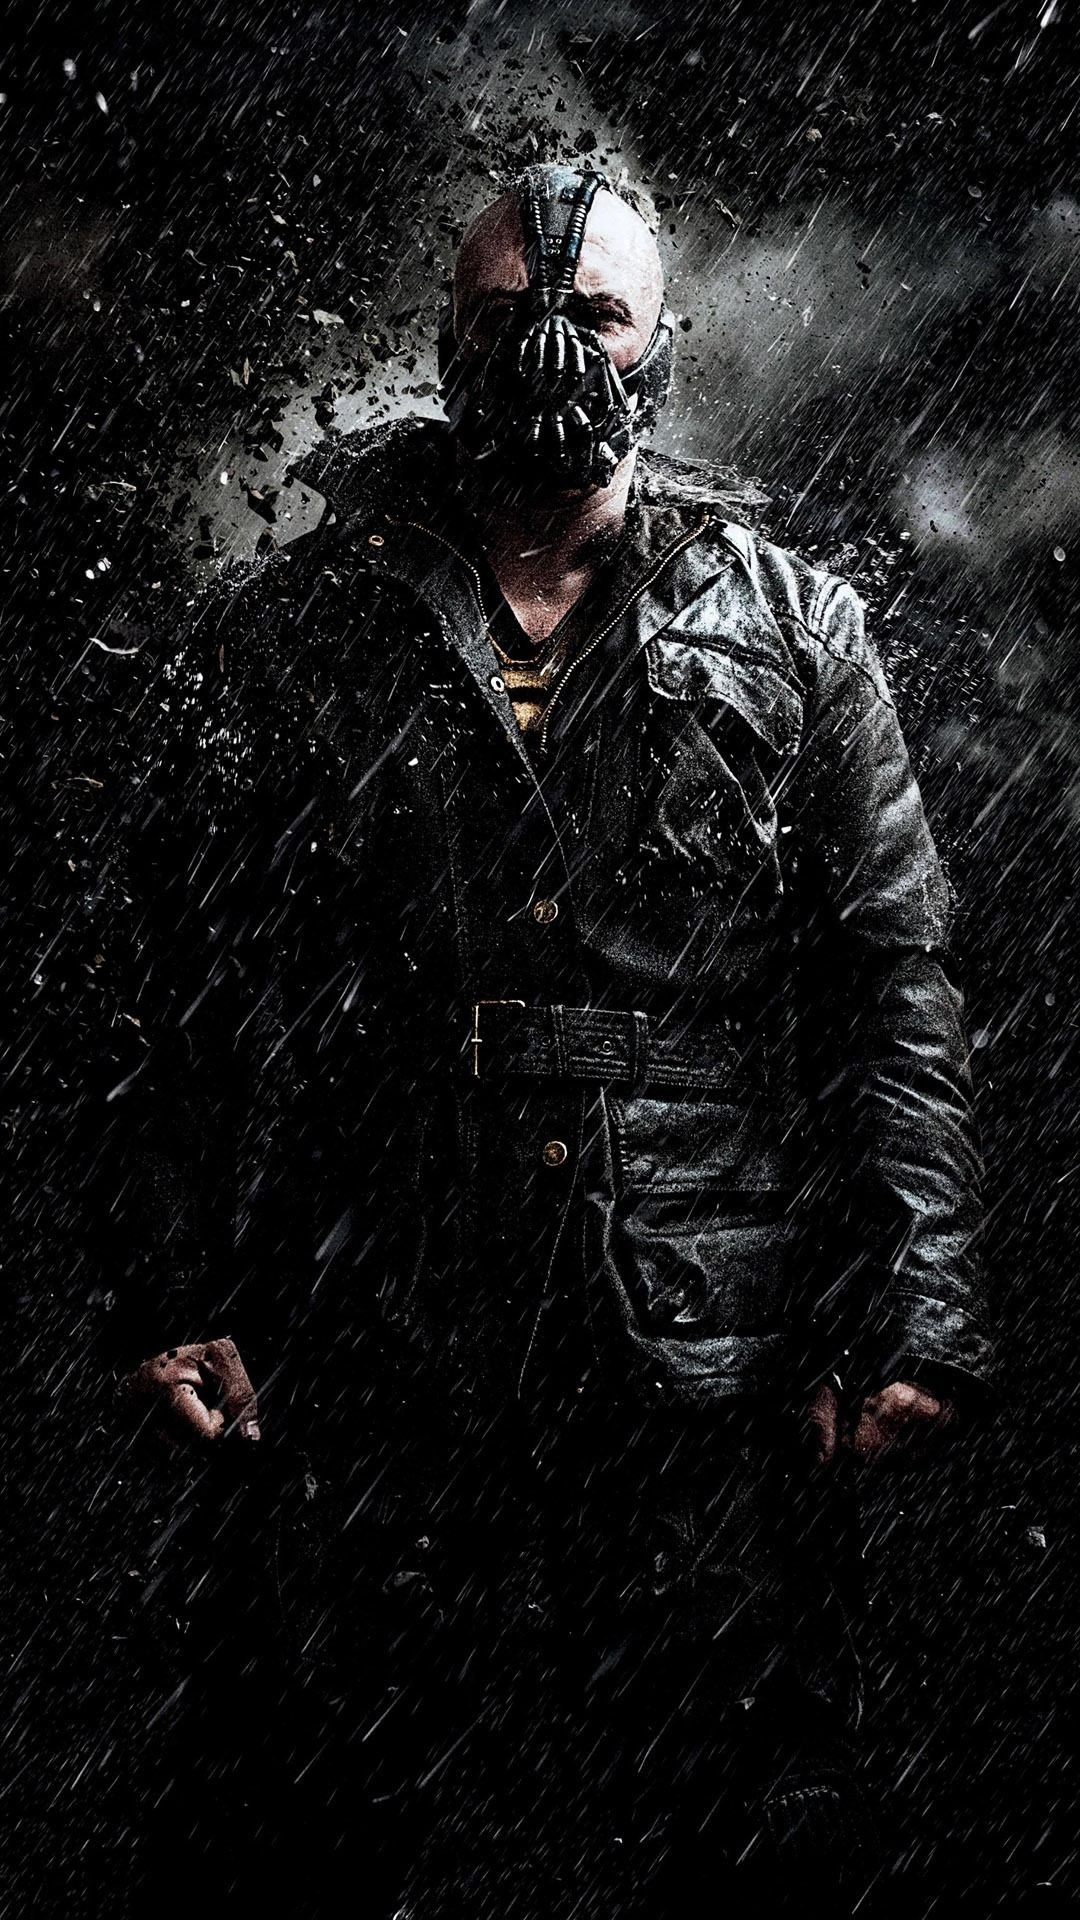 Bane Dark Knight, The Dark Knight Rises, Hd Wallpaper, Wallpapers, Bane Batman